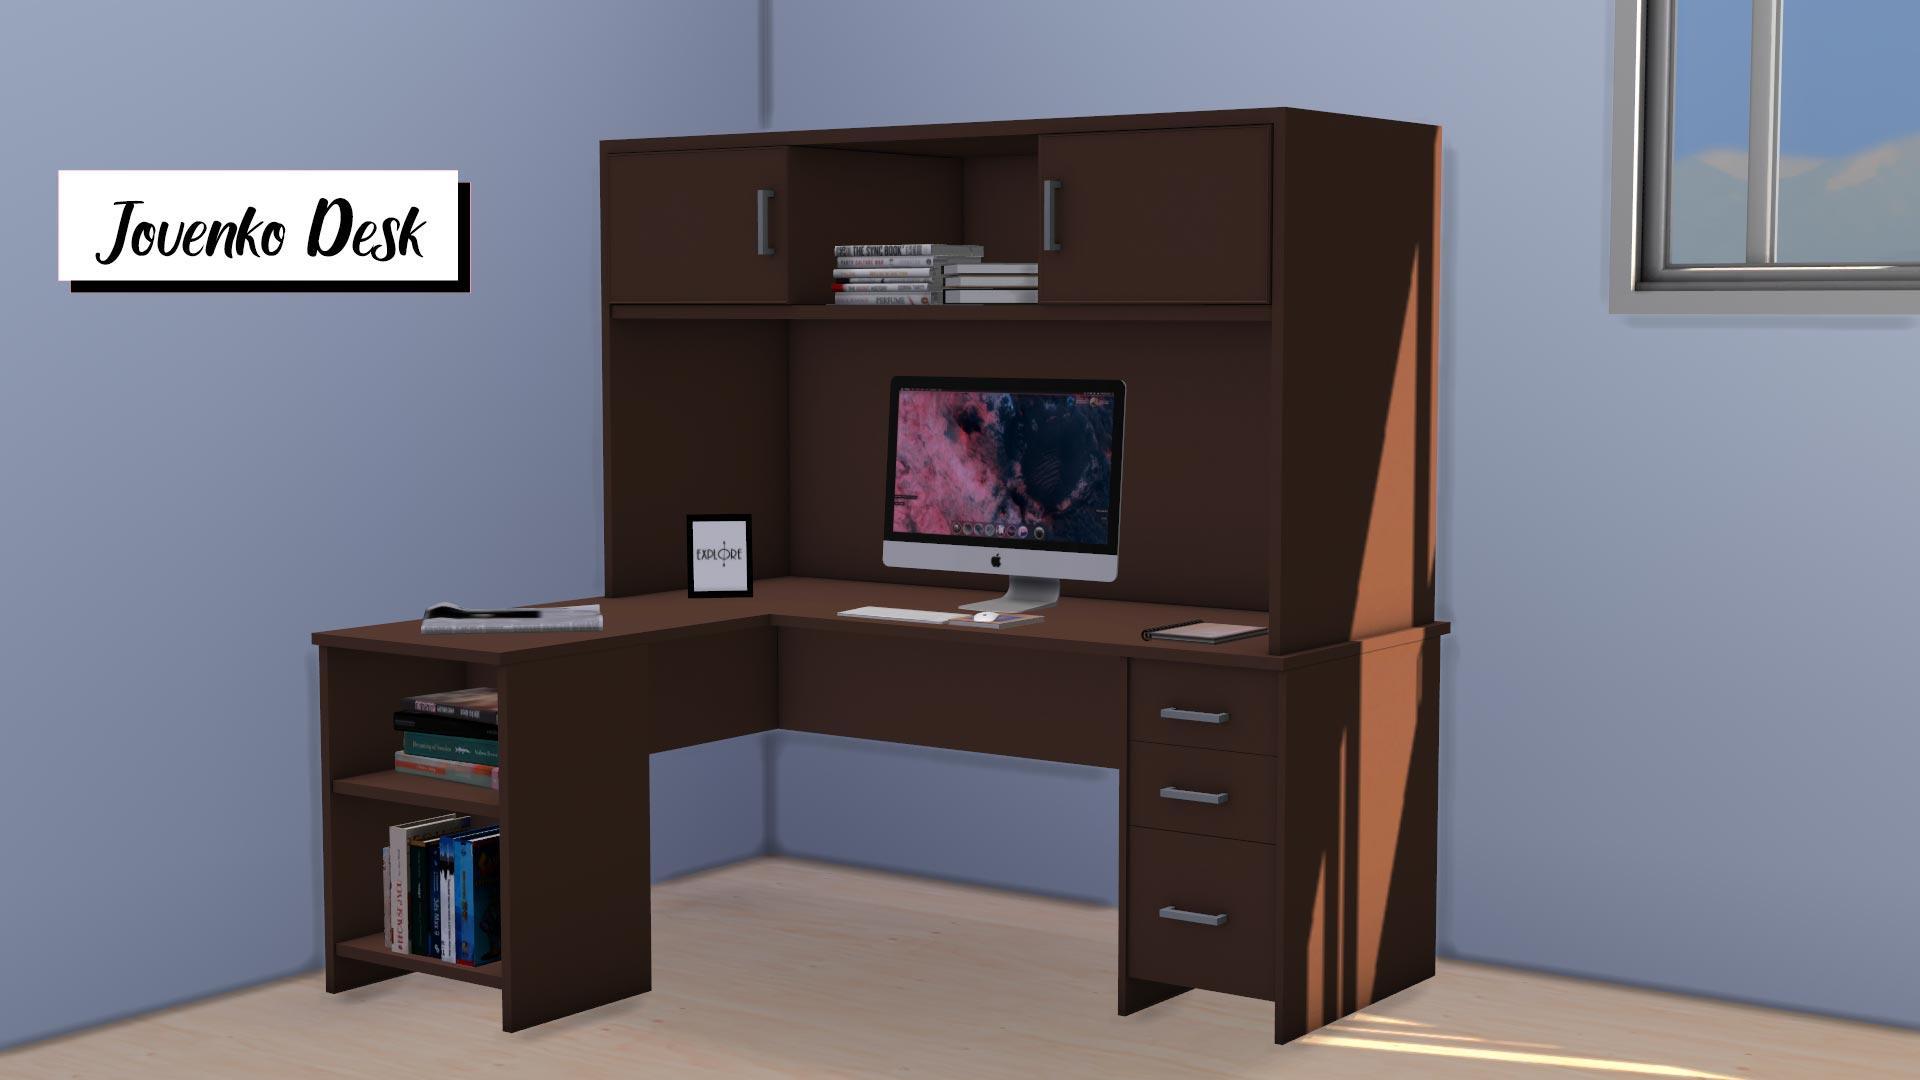 Jovenko Desk, high quality sims 4 cc, sunkissedlilacs, free sims 4 furniture, sims 4 custom content,